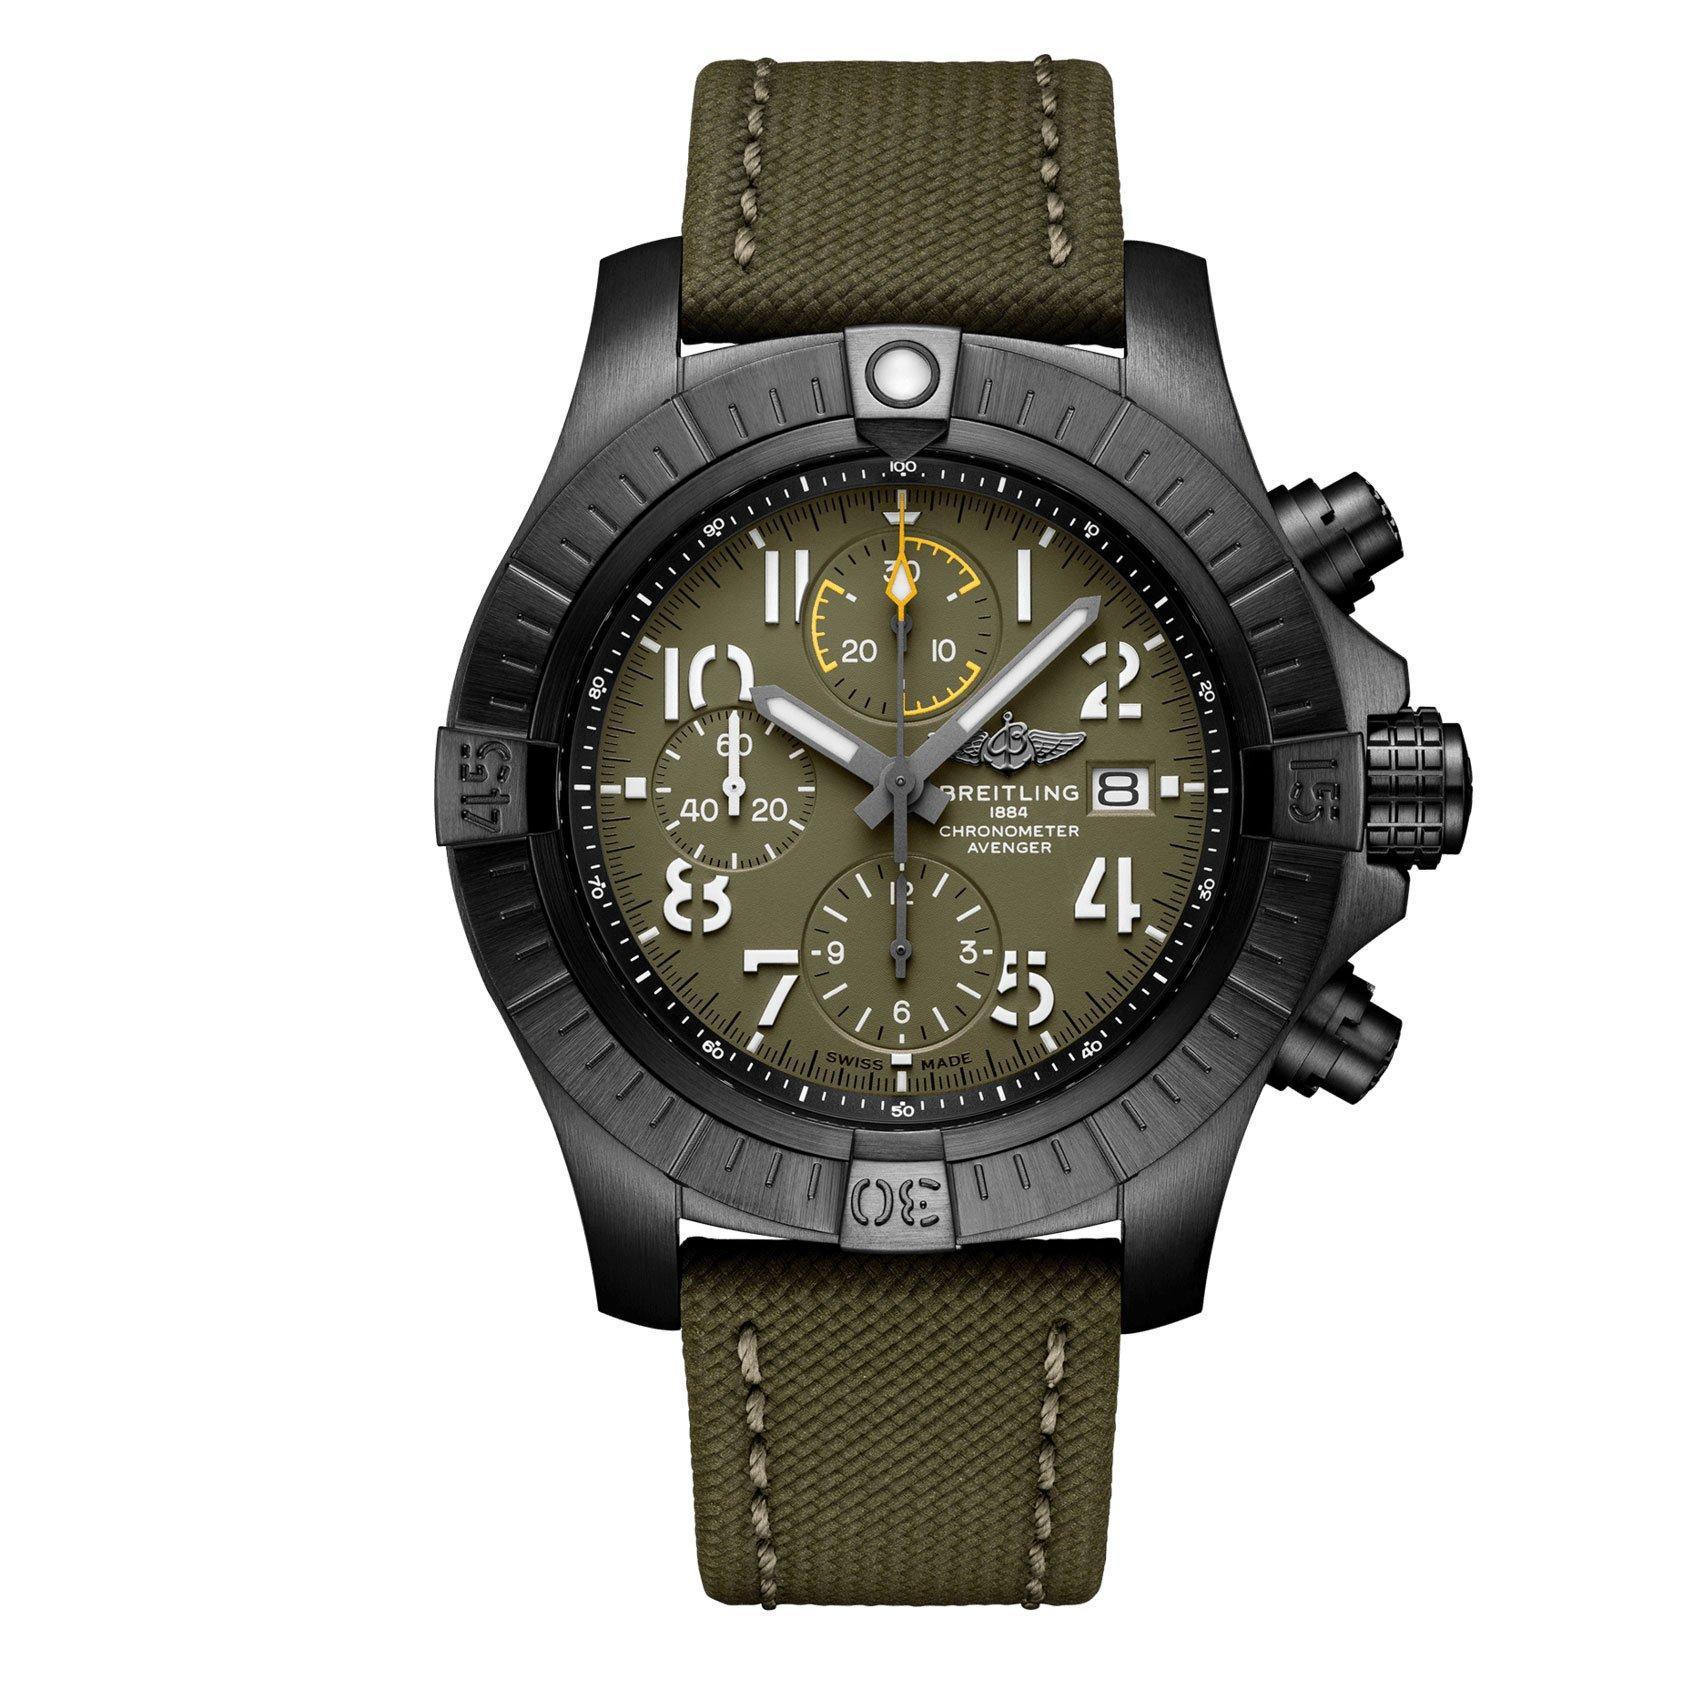 Breitling Avenger Chronograph 45 Night Mission Black Titanium Automatic Men's Watch